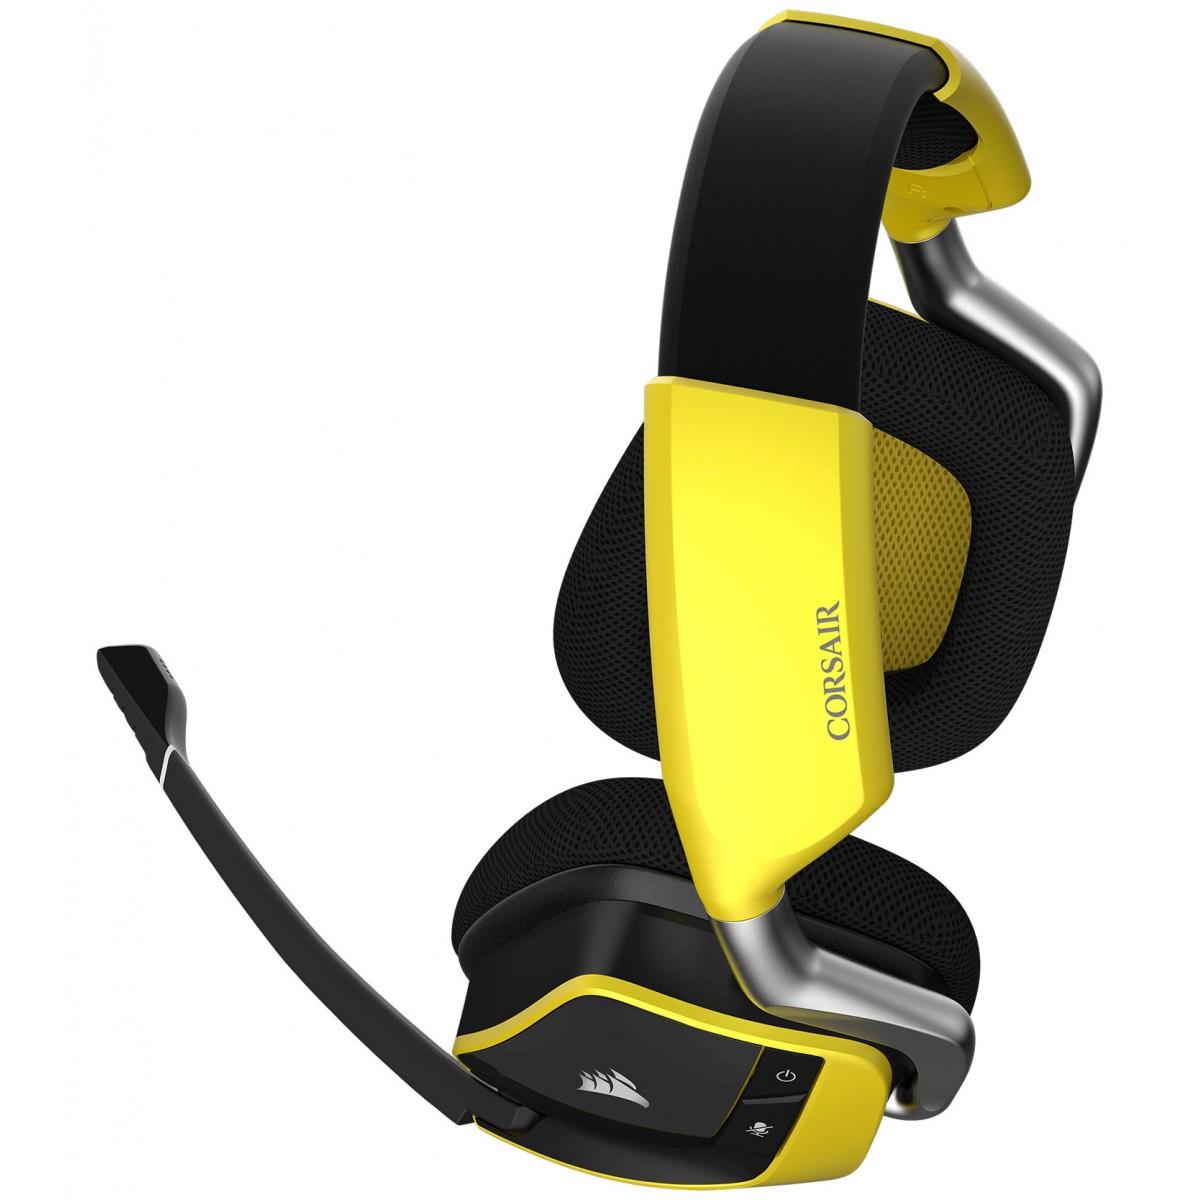 Corsair VOID PRO RGB Wireless 7.1 SE Premium Gaming Headset -Yellow